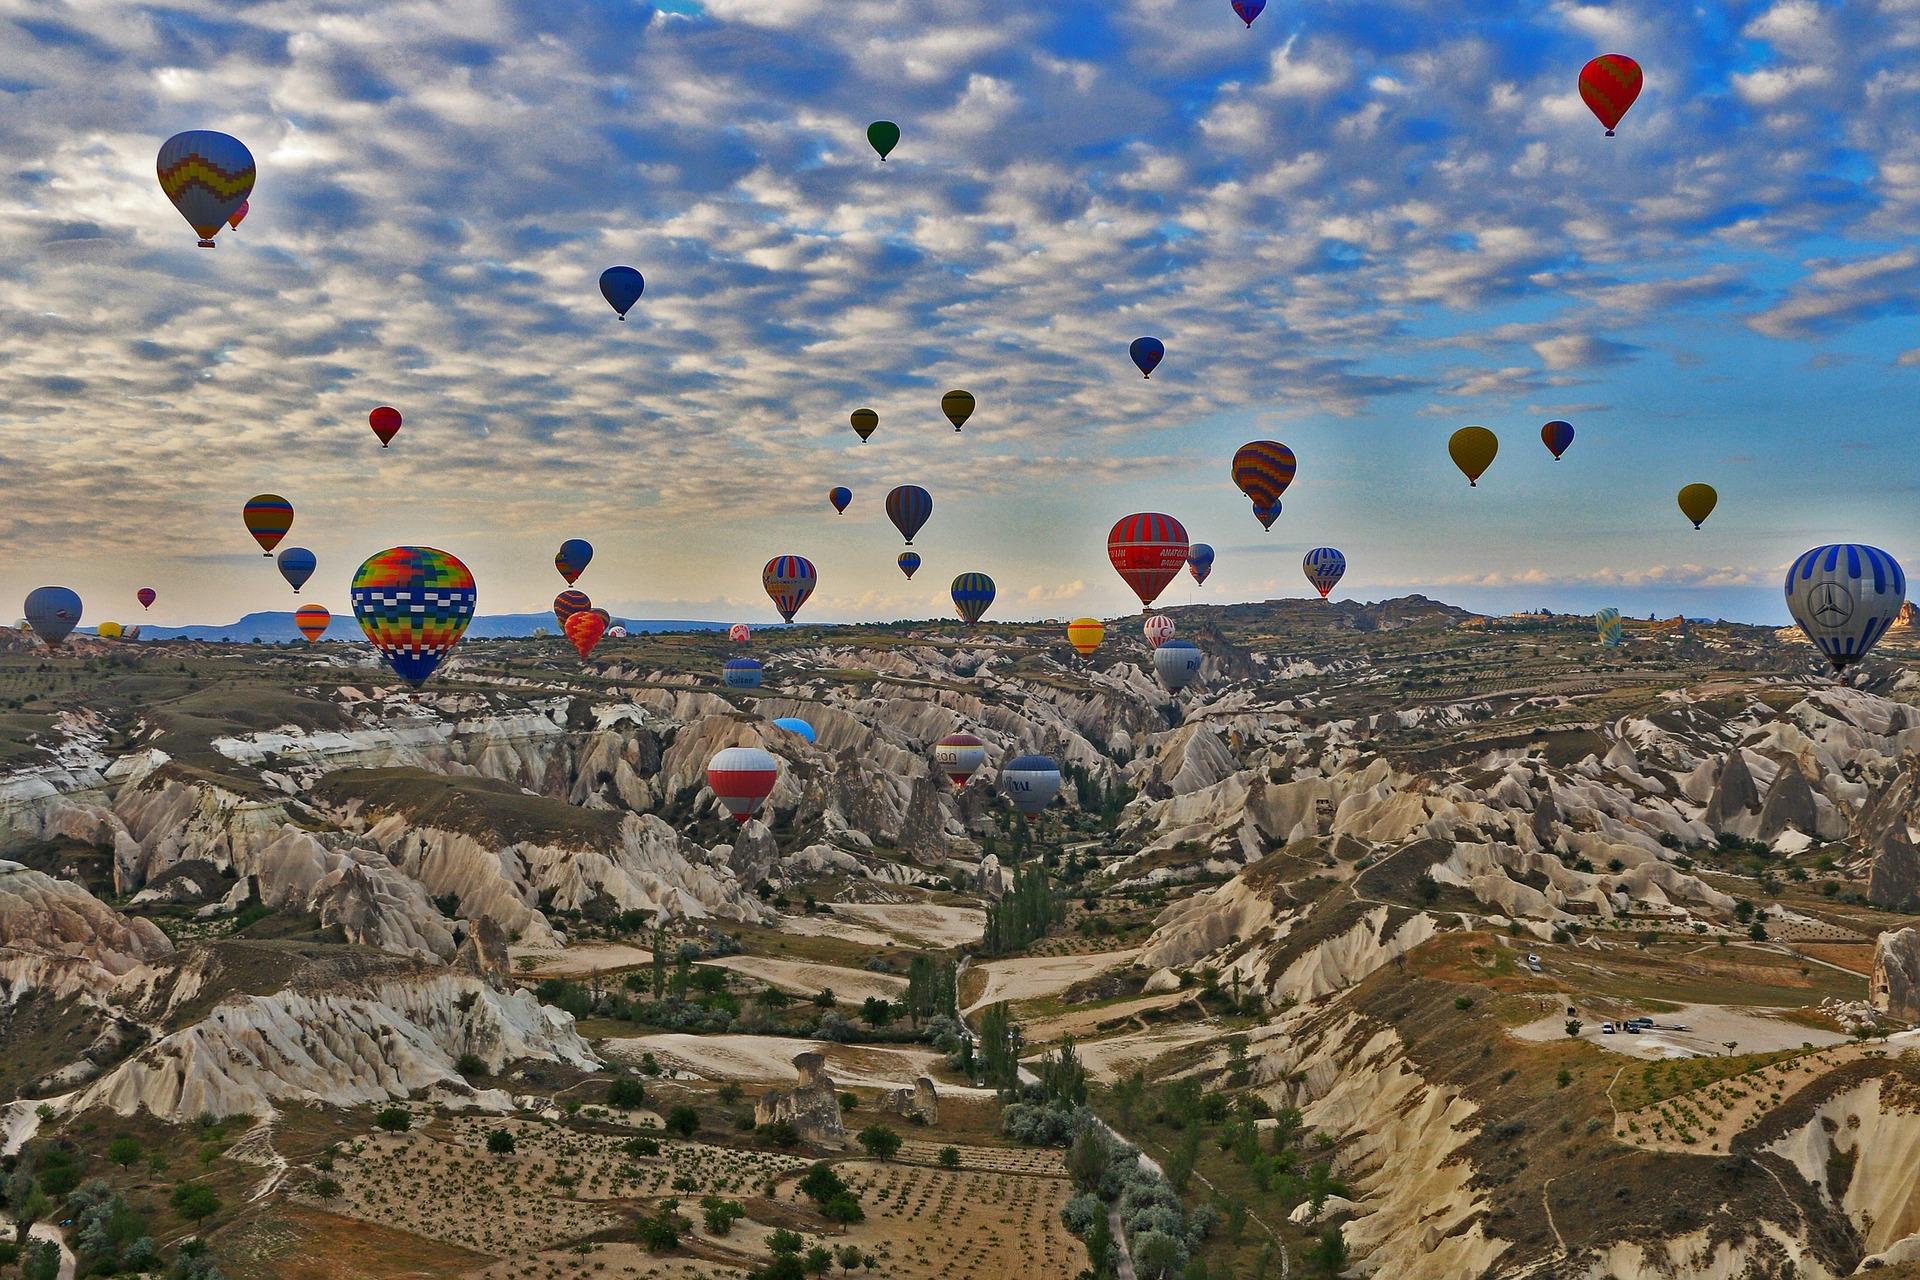 Cappadocia Map - Things to do in Cappadocia - TURKEY TRAVEL ... on ardahan map, ankara map, dolmabahce palace map, pamukkale map, carpathian mountains map, anatolia map, turkey map, tatev monastery map, kayseri map, lycian sea map, macedonia map, bitlis map, nevsehir pazar map, cilicia map, underground city, mount nemrut, campania map, pontus map, troy map, goreme map, mount ararat, derinkuyu underground city, phthia map, ephesus map,